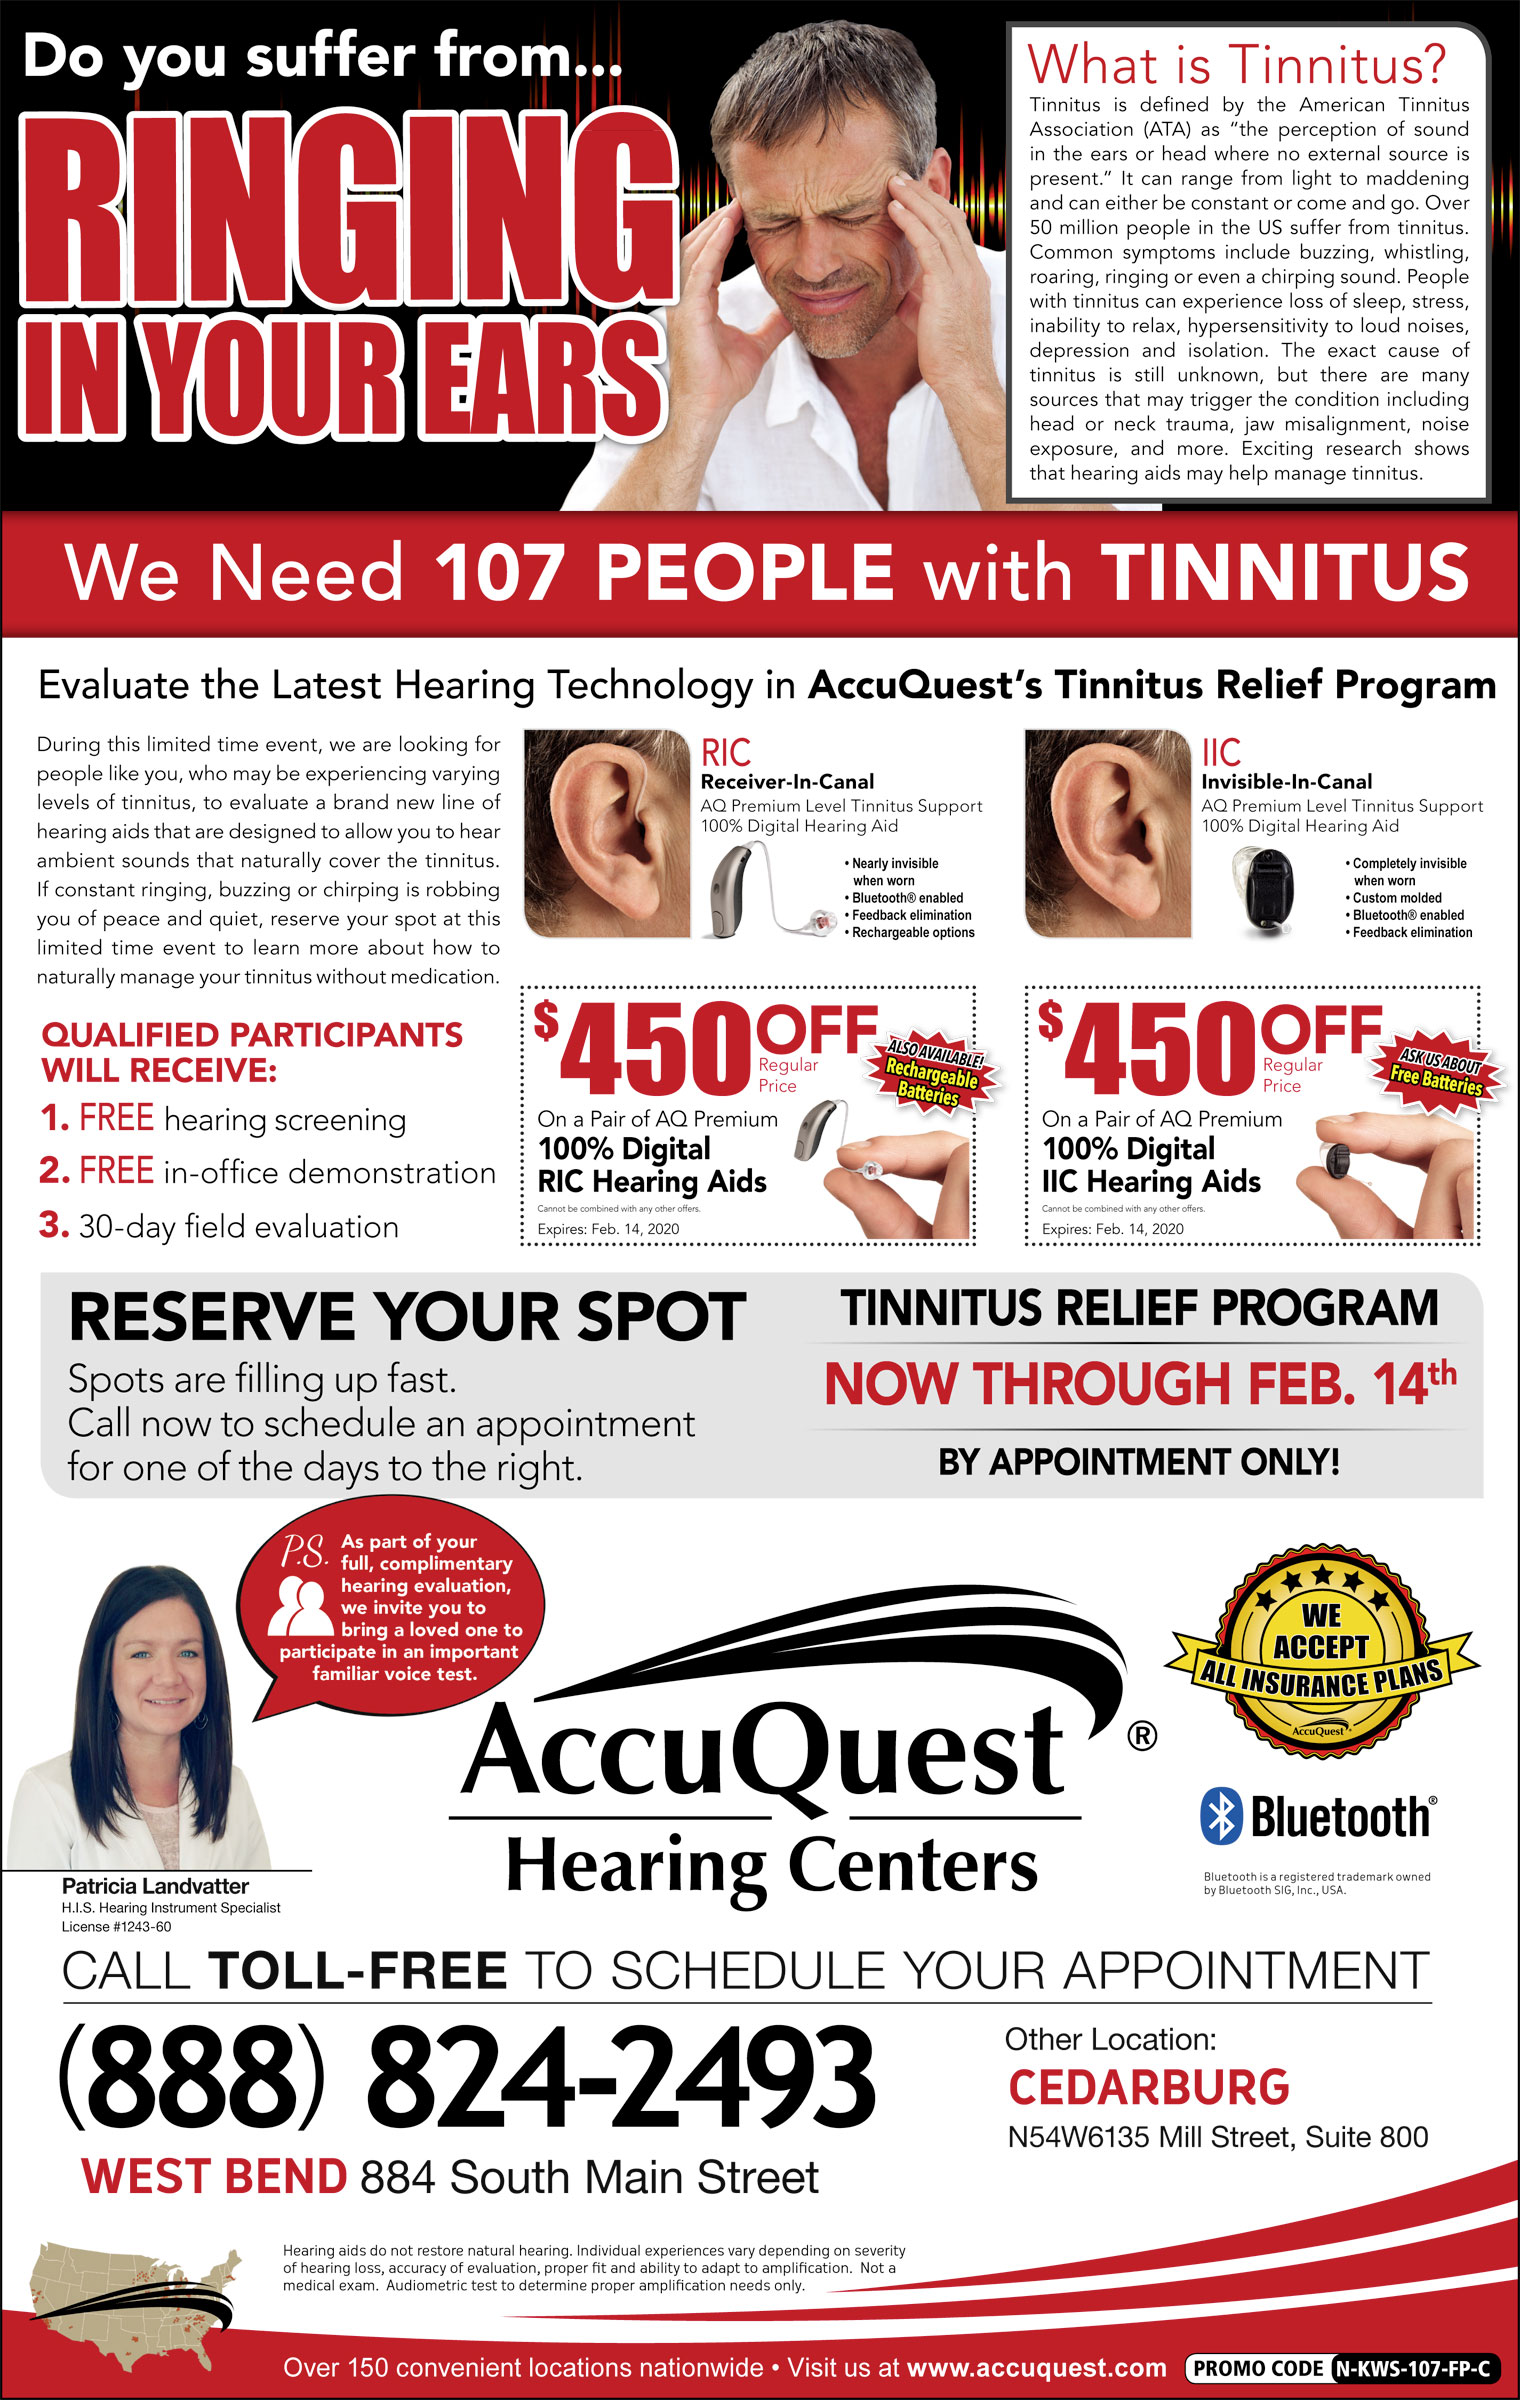 Accuquest Hearing